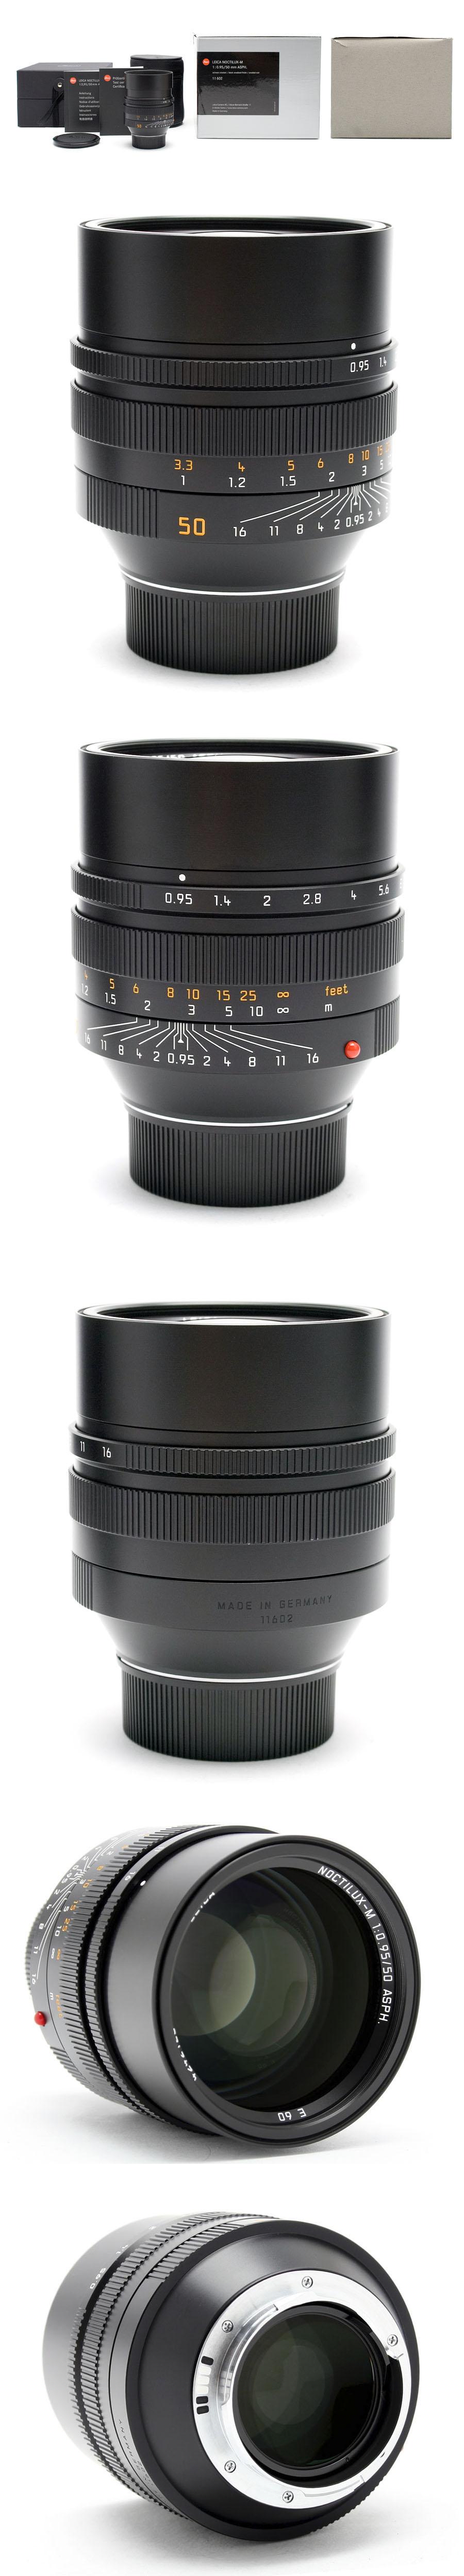 focus f2 camera strap instructions